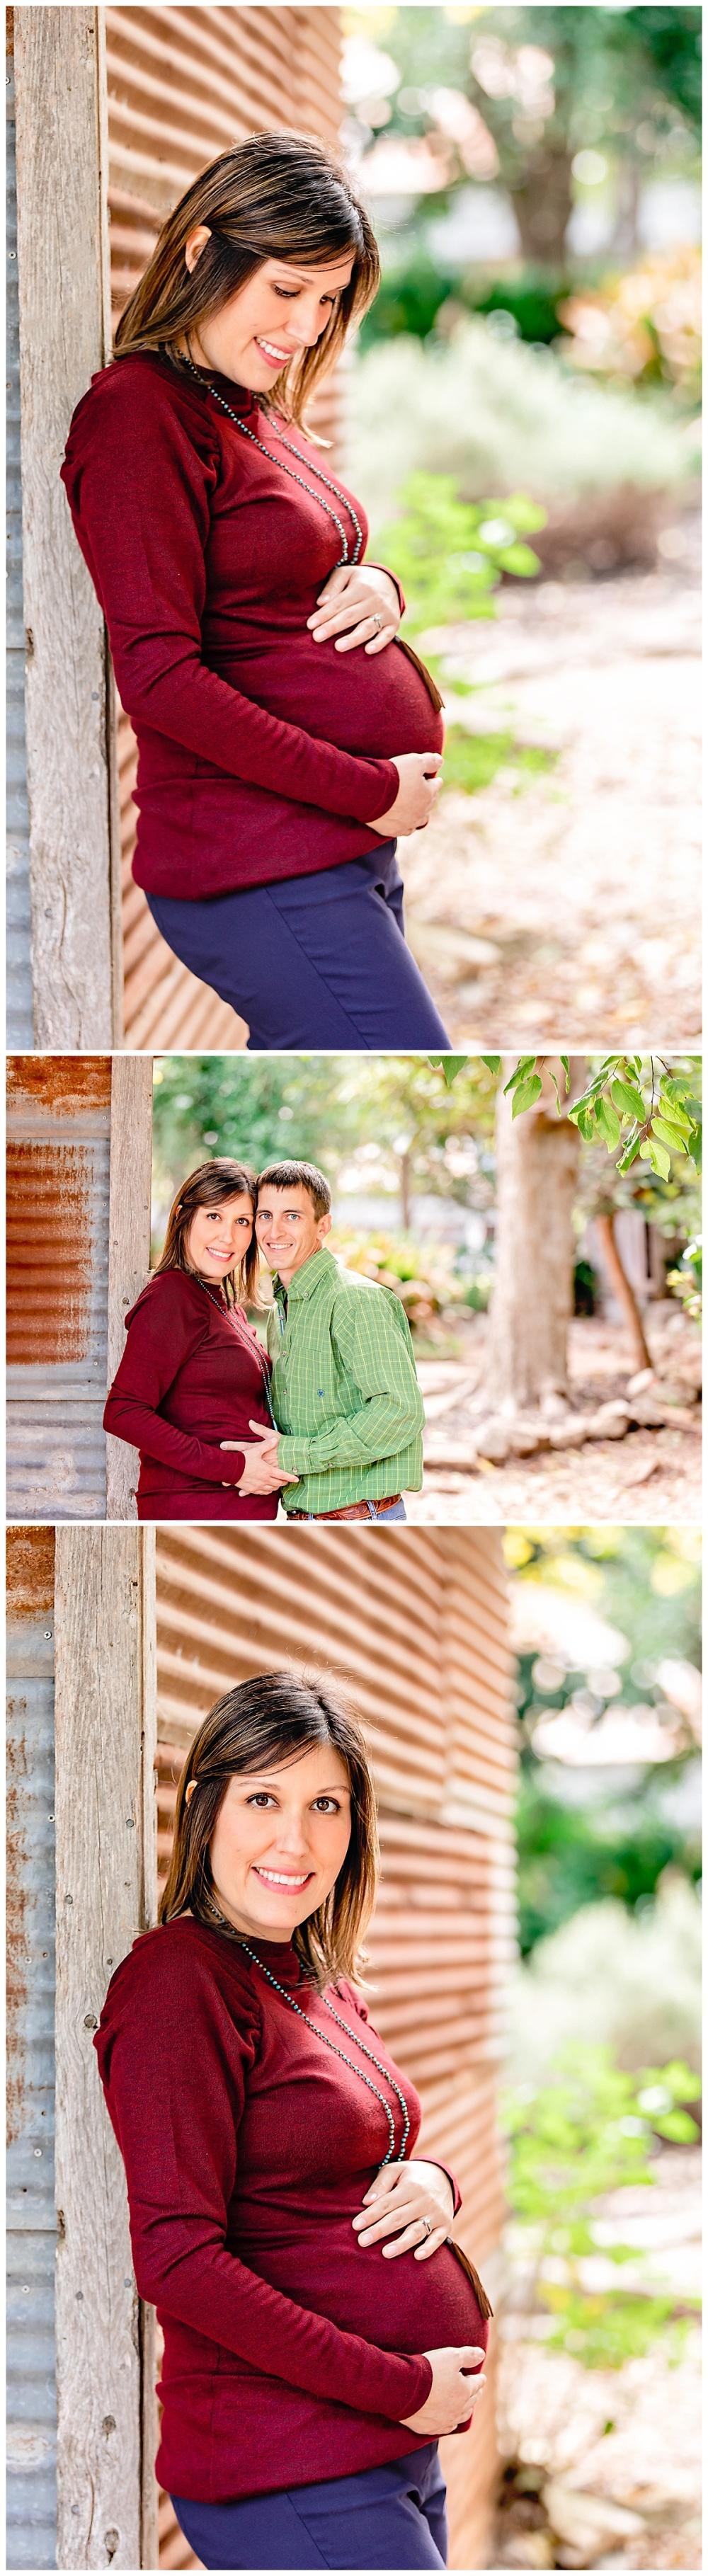 Family-Photographer-Gruene-Texas-Fall-Carly-Barton-Photography_0006.jpg